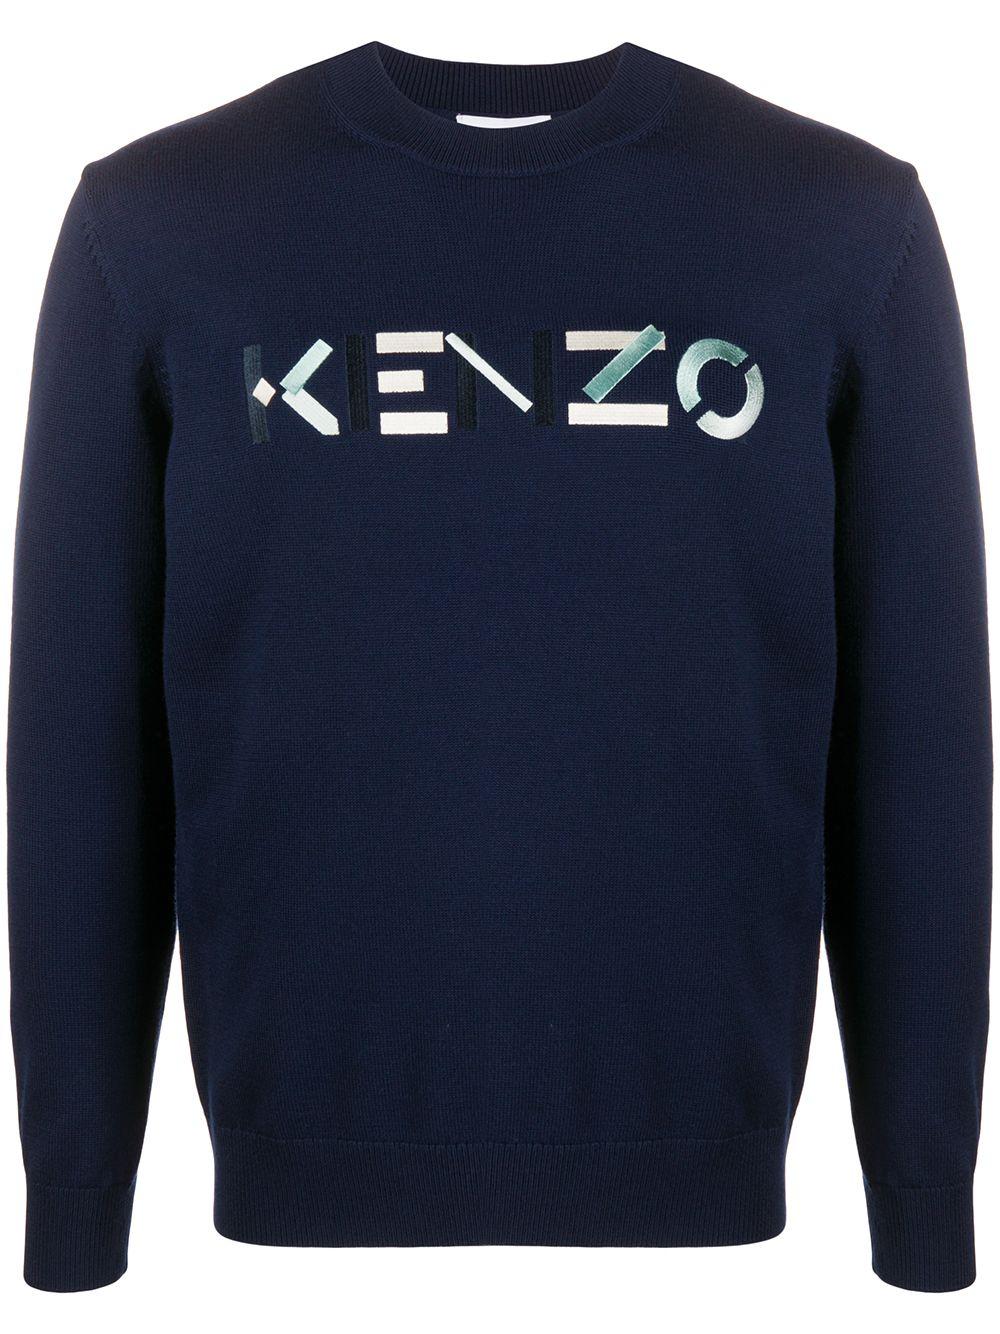 Kenzo Sweatshirt mit Logo-Stickerei - Blau